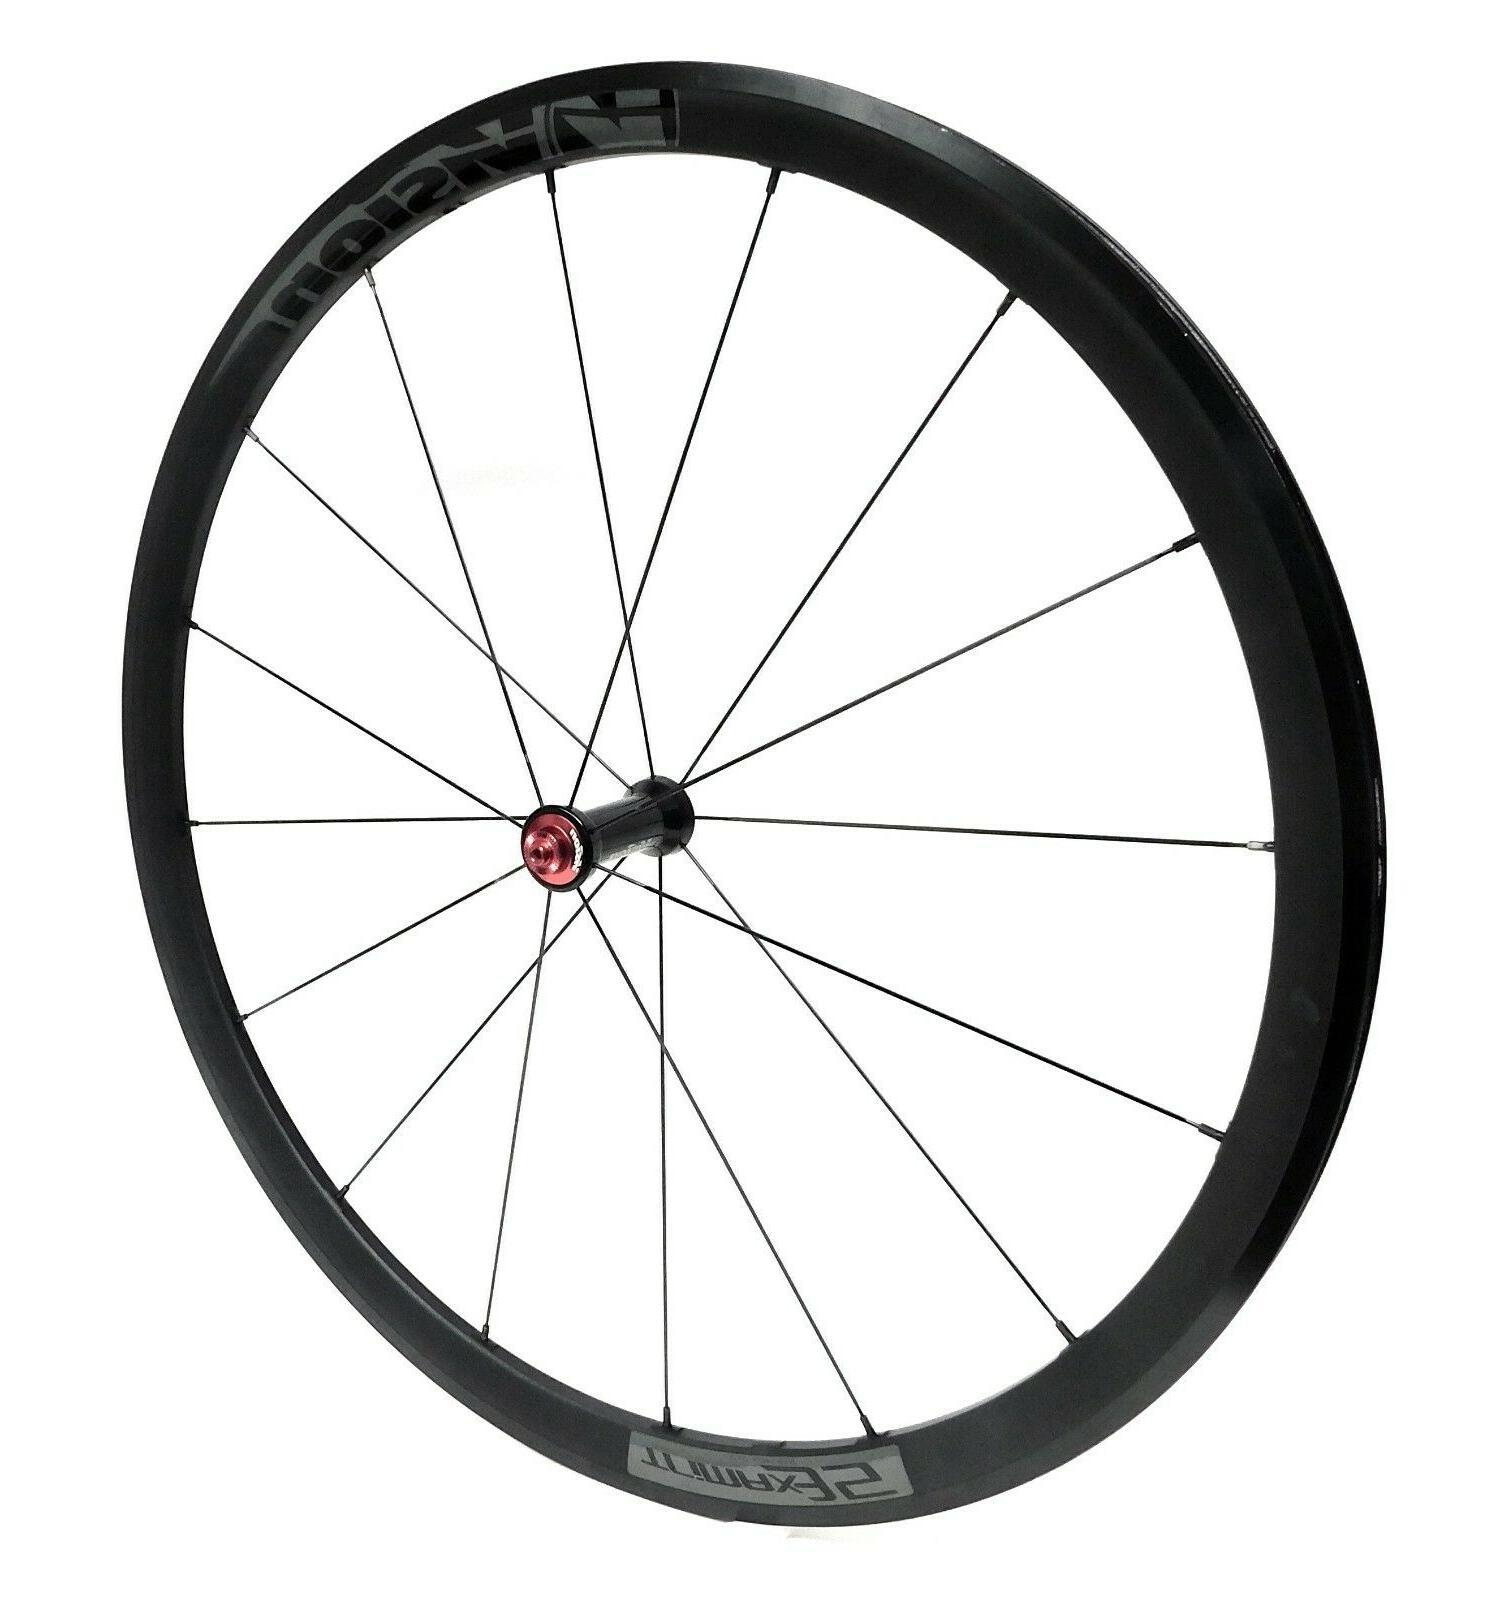 Vision Trimax 35 Bike Wheelset Clincher Shimano/SRAM 11s